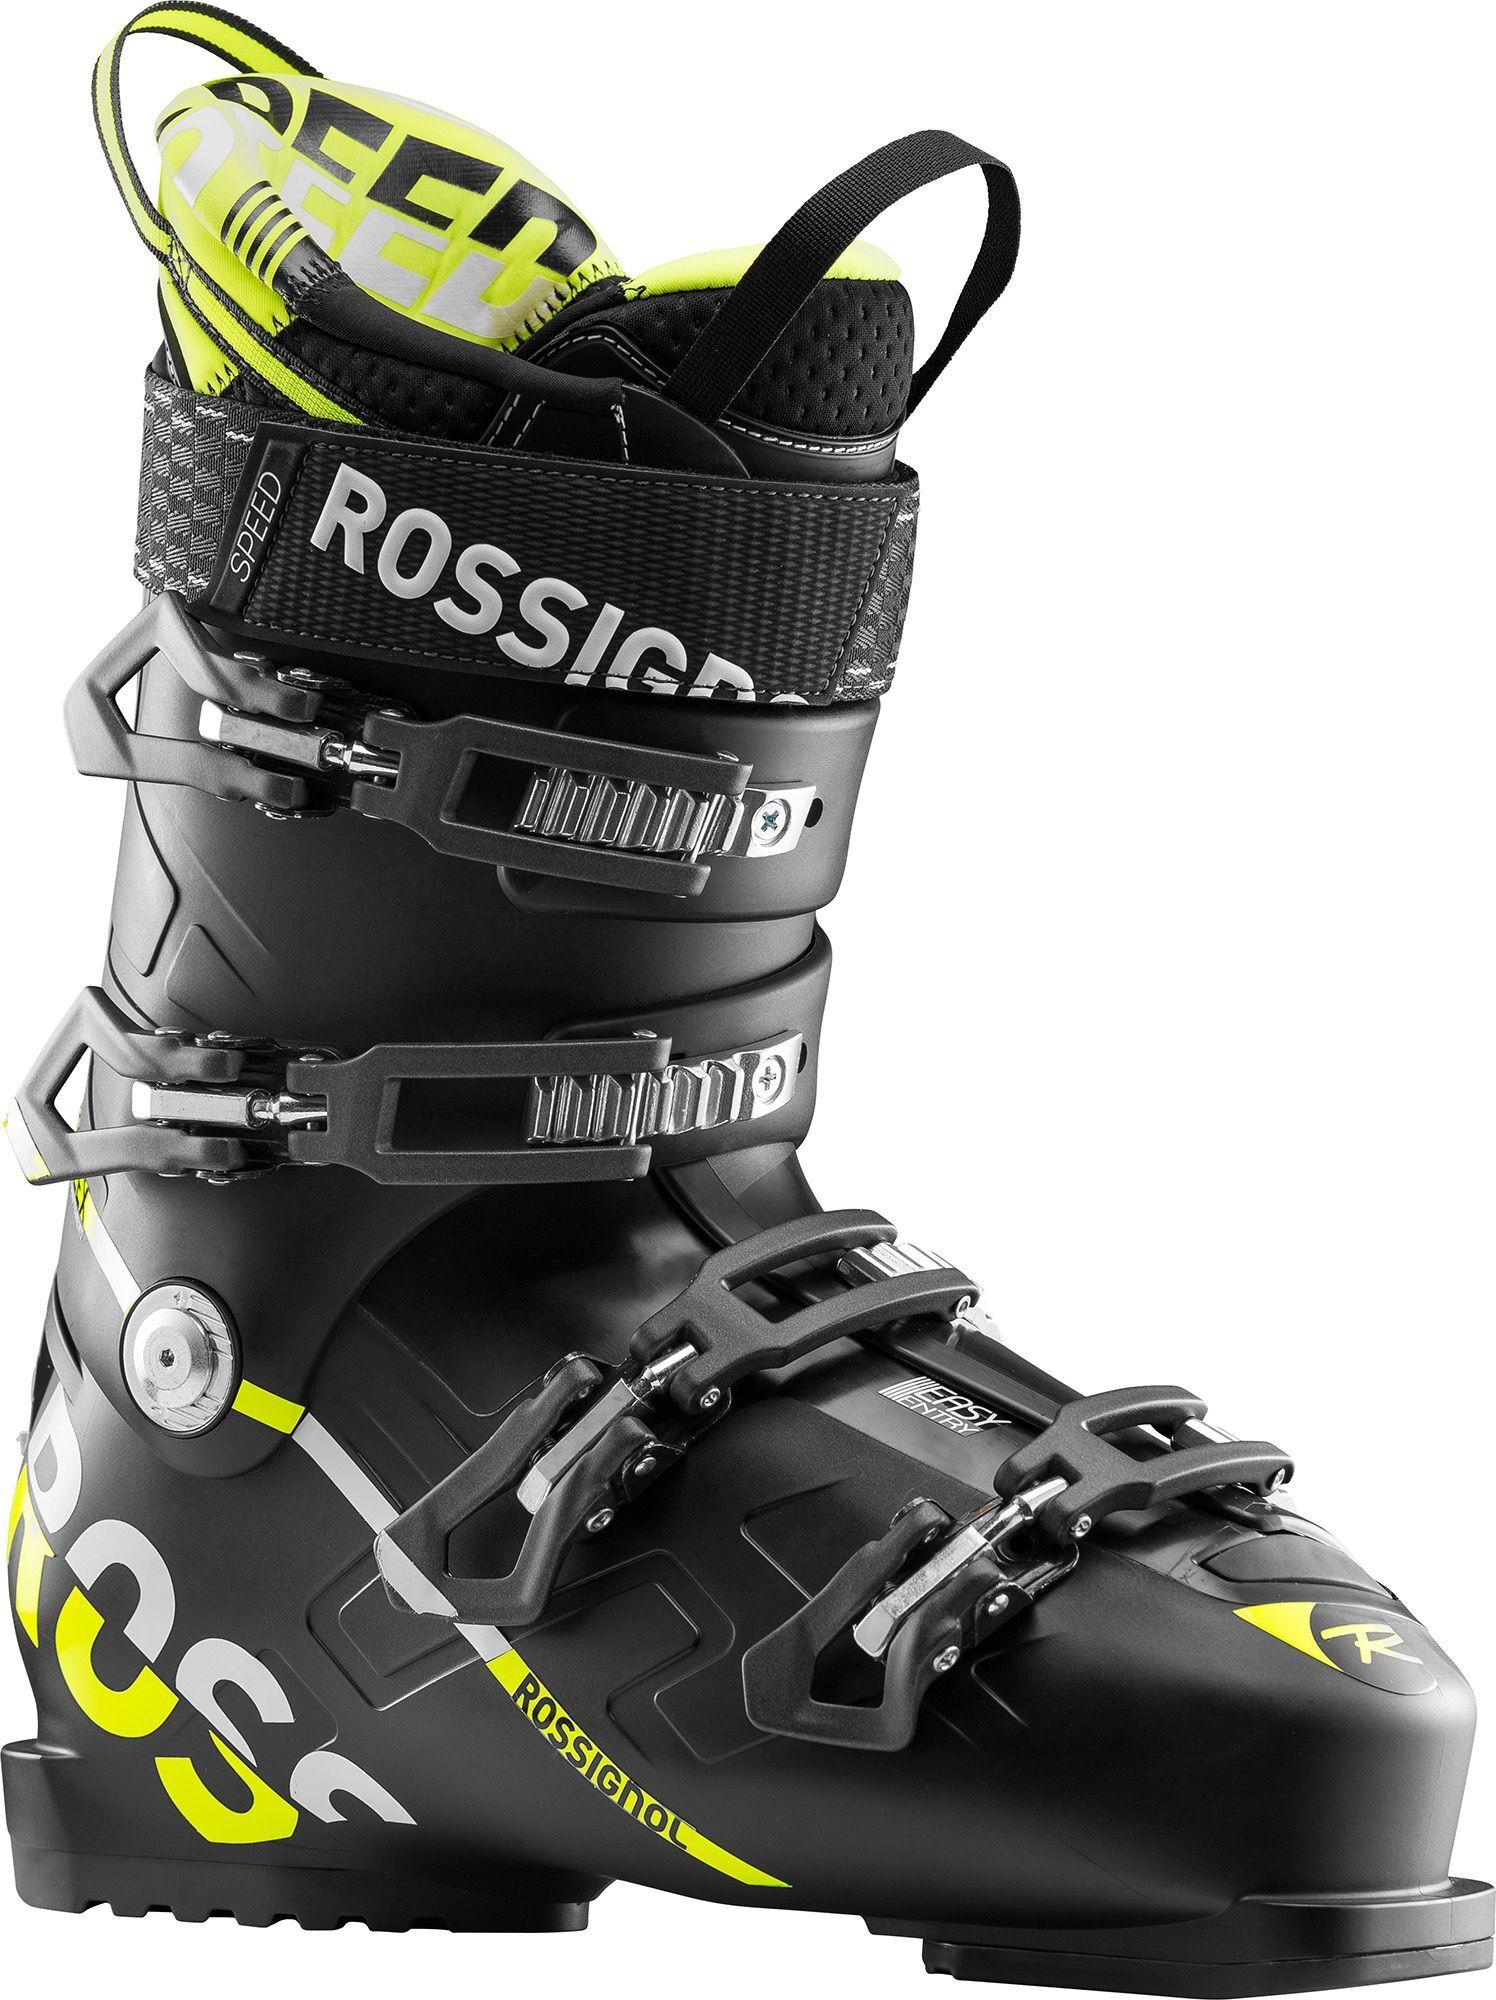 Rossignol ski cipele SPEED 100 - BLACK YELLOW